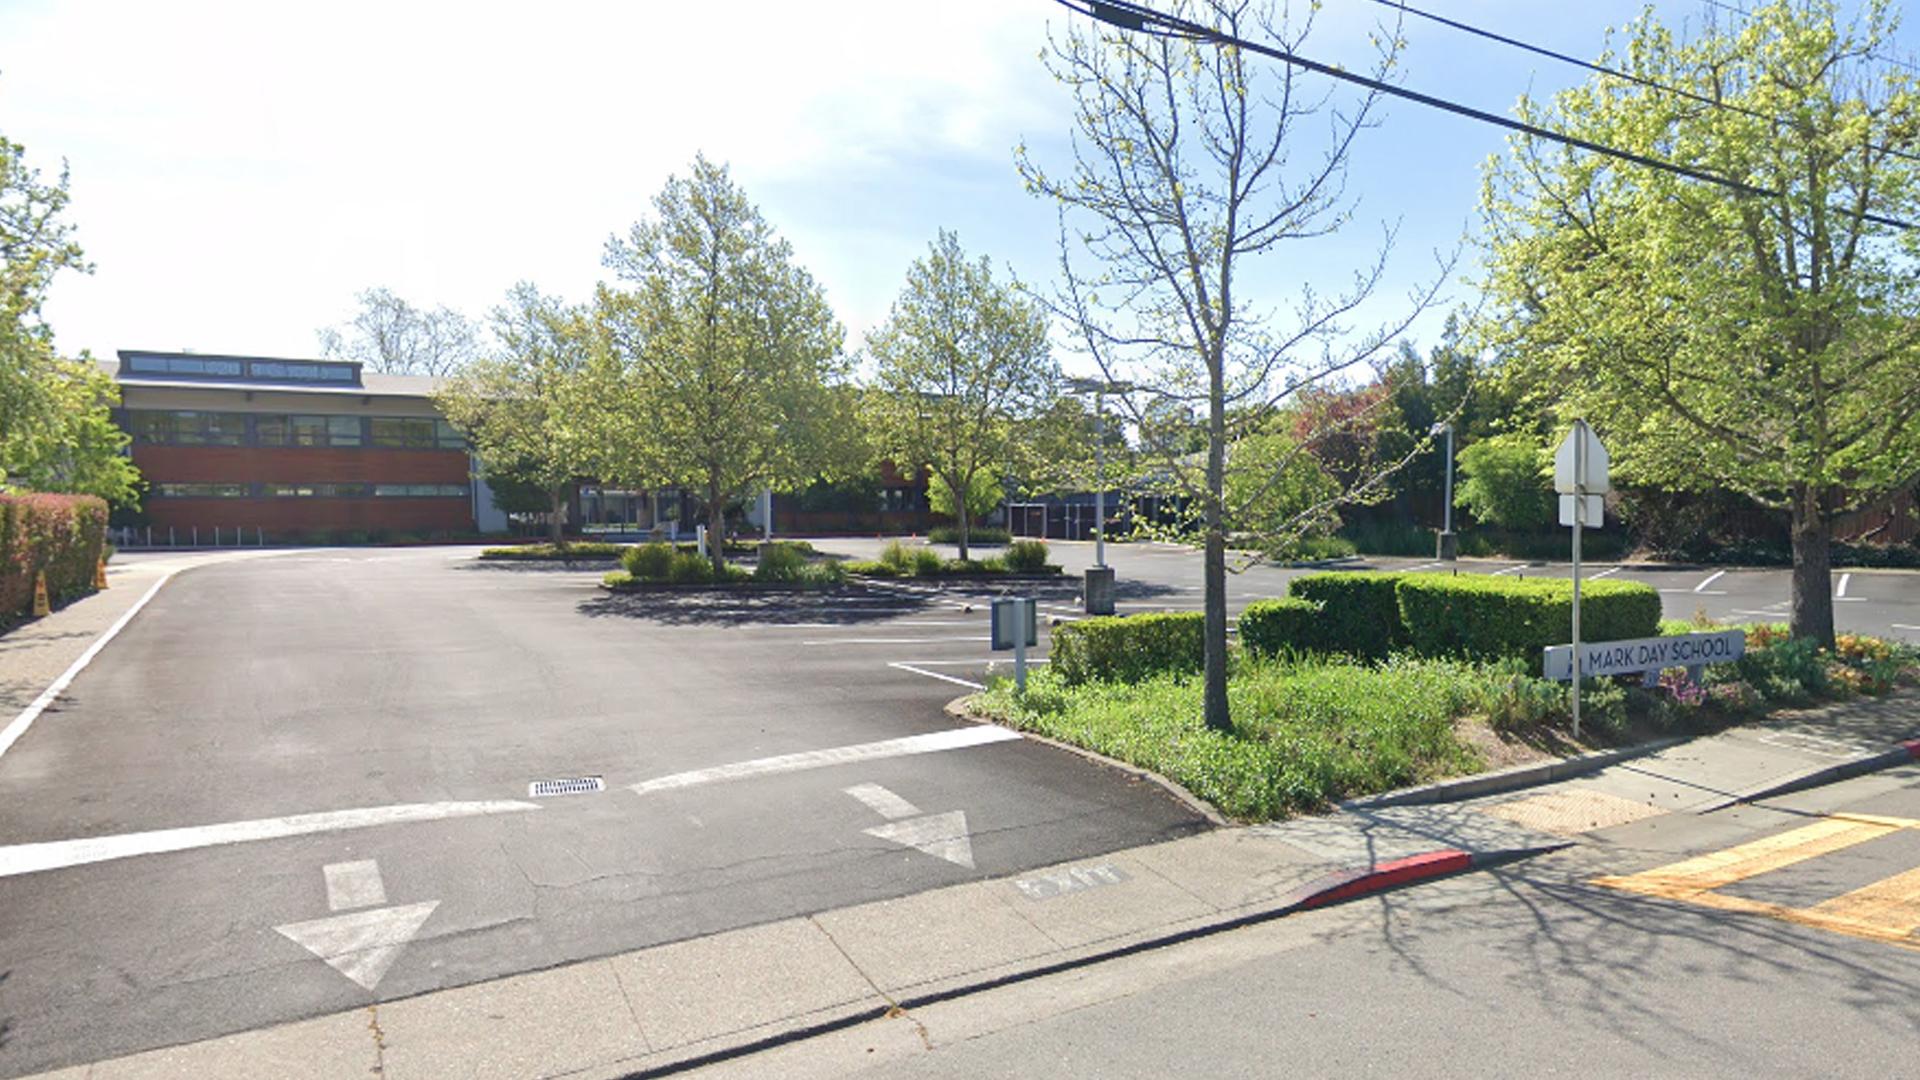 6 Year Old Dies When Fence Falls On Him At San Rafael School Within San Rafael School District Calendar